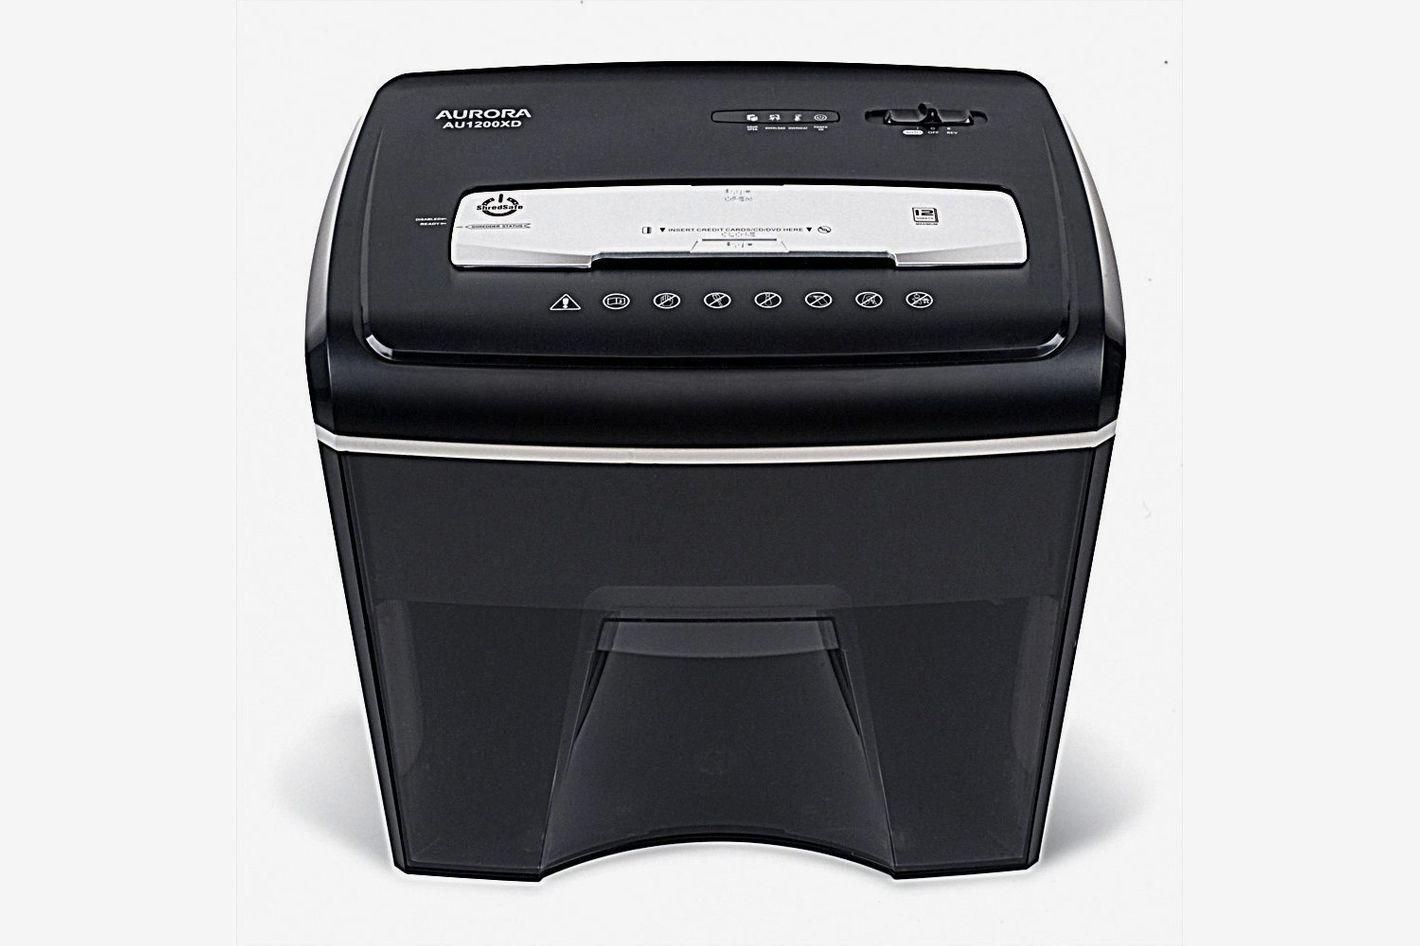 Aurora AU1200XD Compact Desktop-Style Basket Shredder